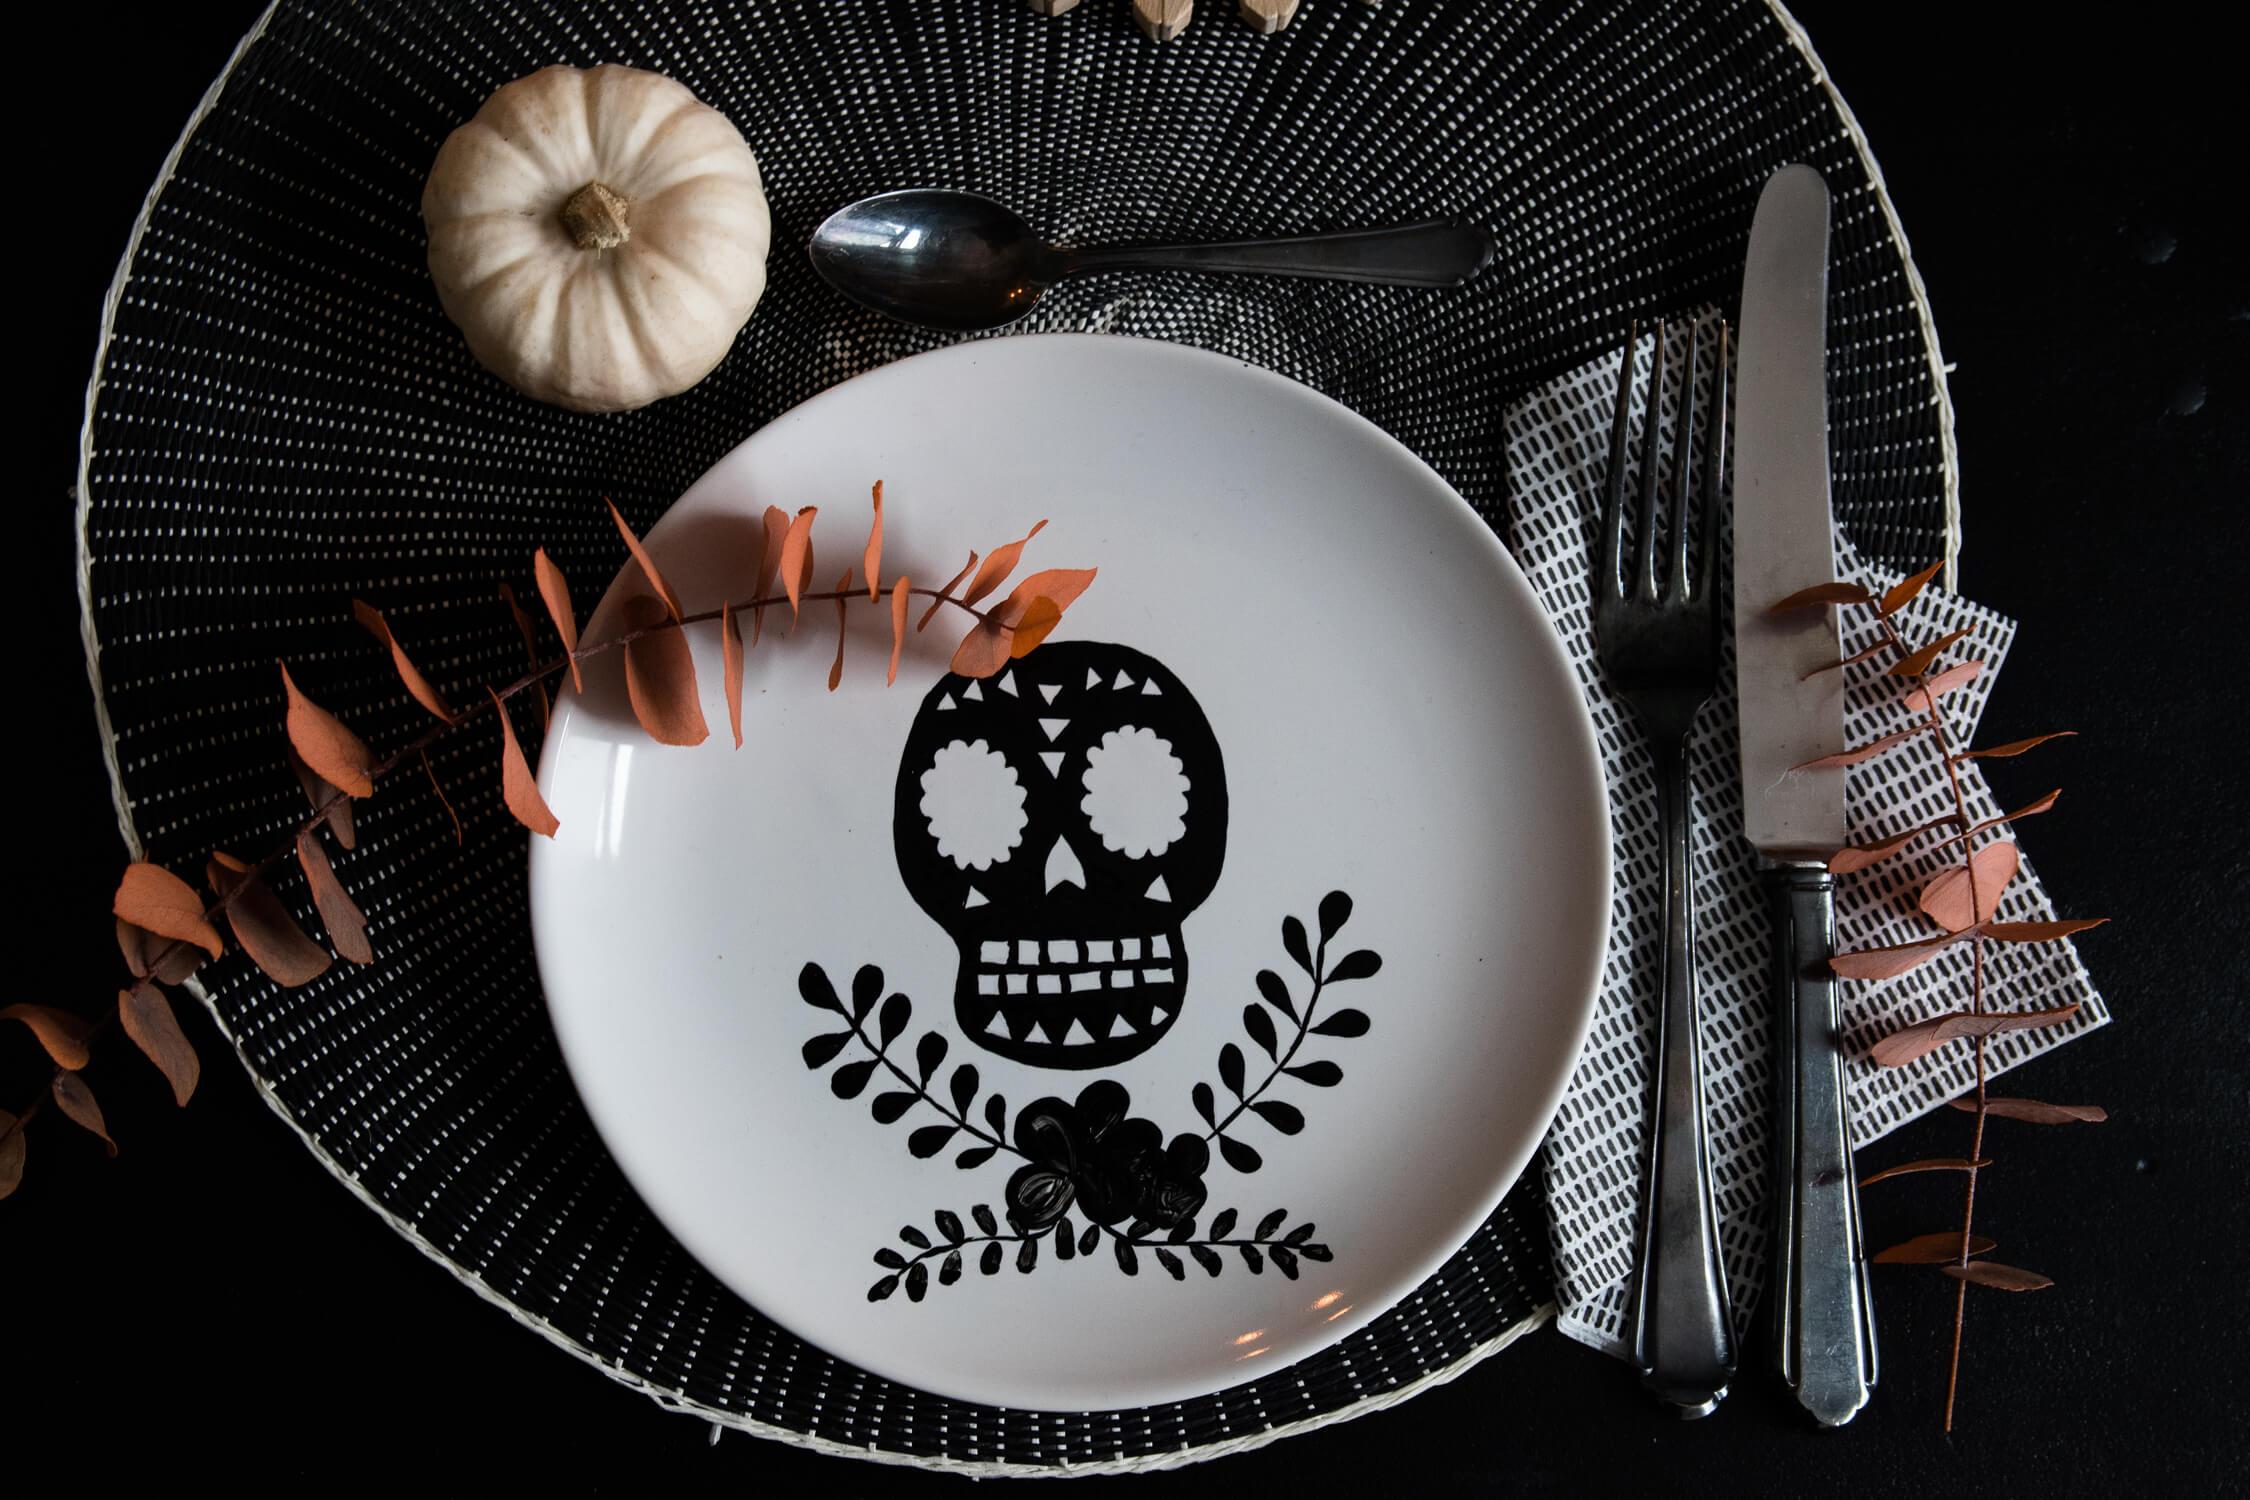 DIY Blog Carftifair Halloween Teller Skull bemalen - Porzellan